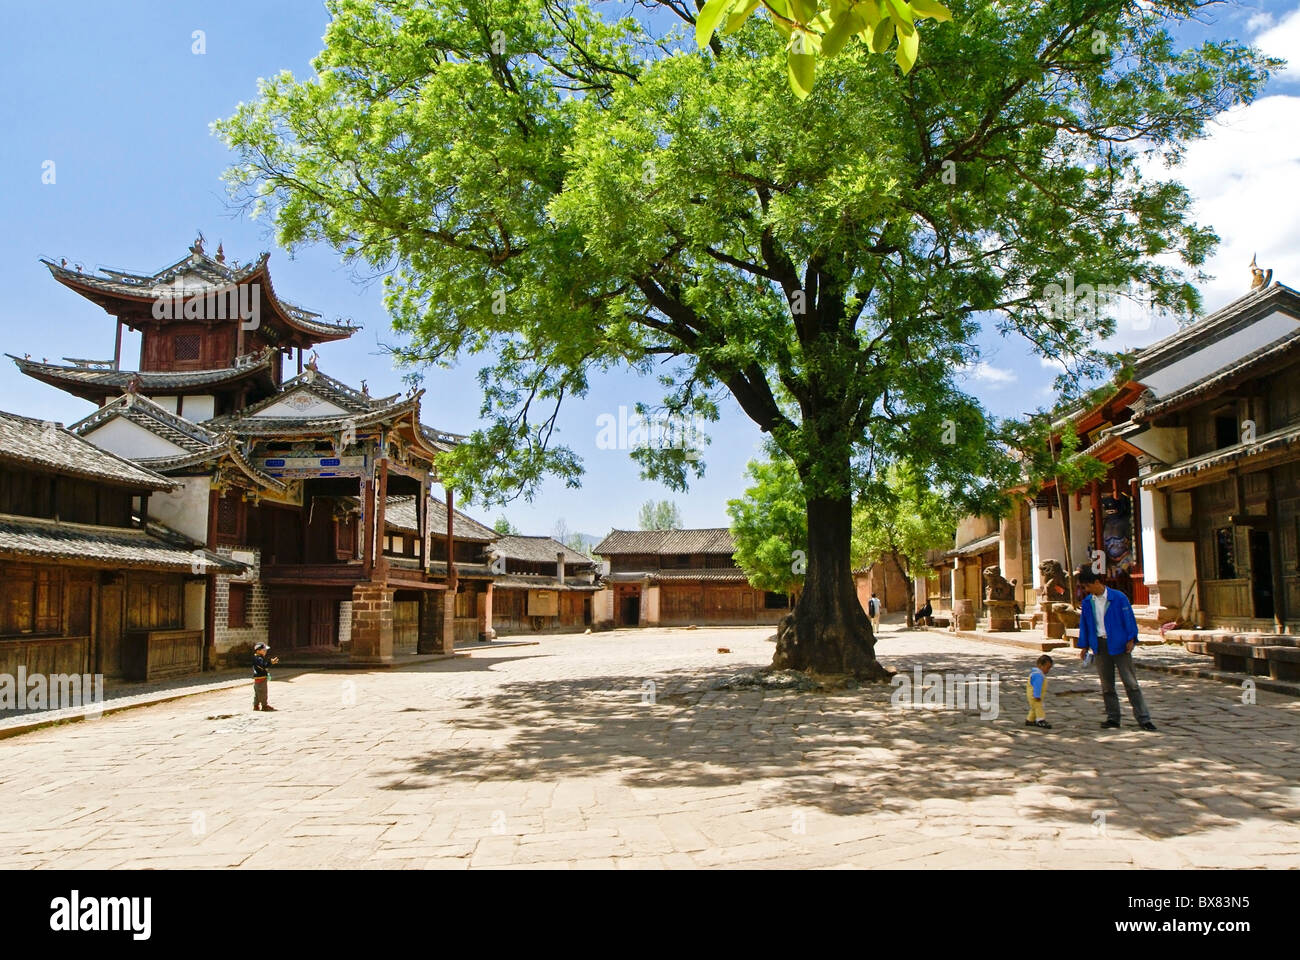 Three Terraced Pavilion on Sideng Street, Shaxi, Jiangsu, China Stock Photo